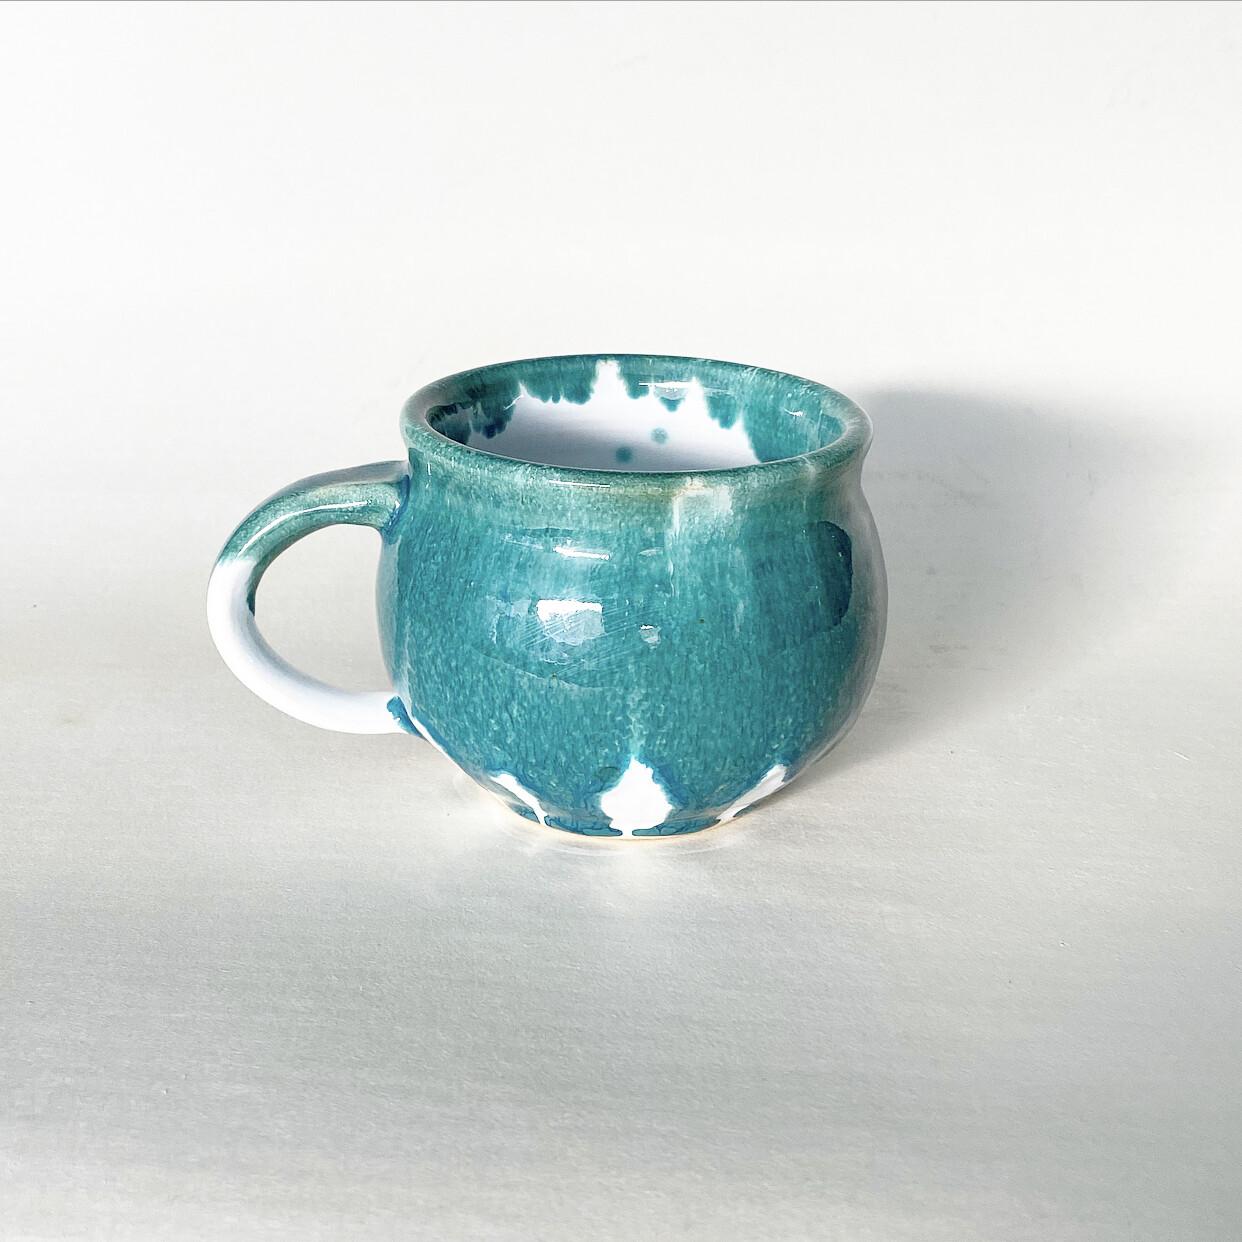 16oz Drippy Teal Mug